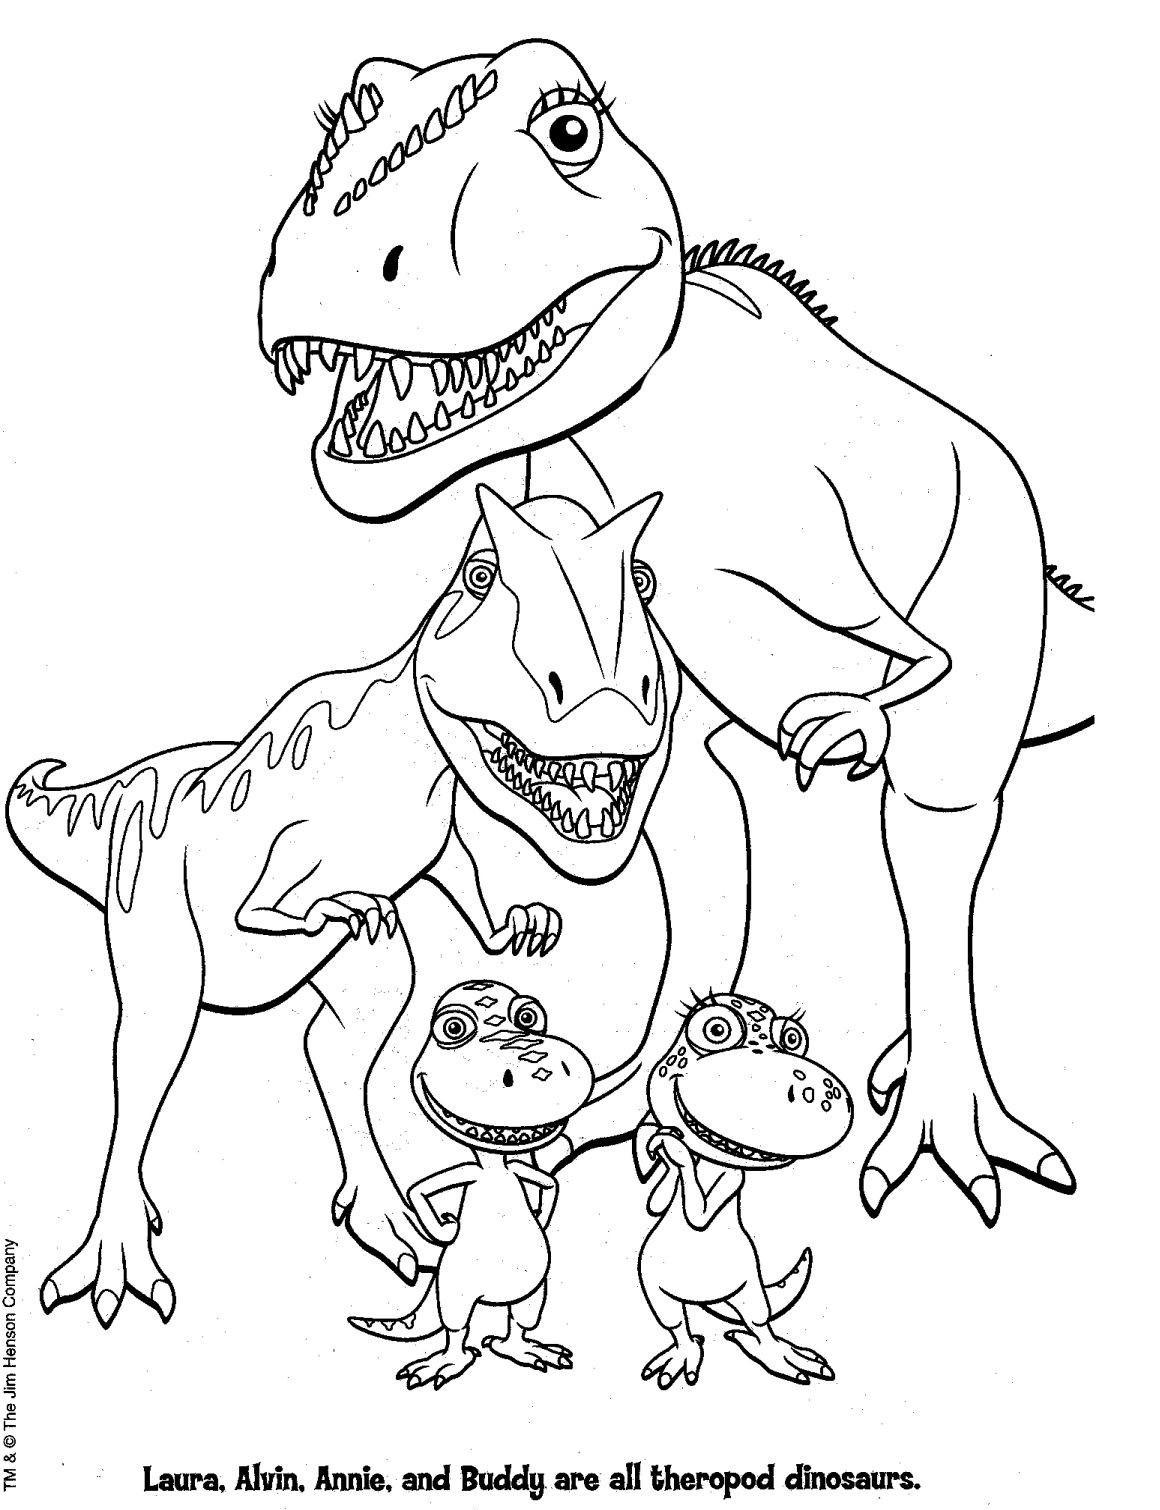 Printable Dinosaur Coloring Pages at GetDrawings.com | Free ...